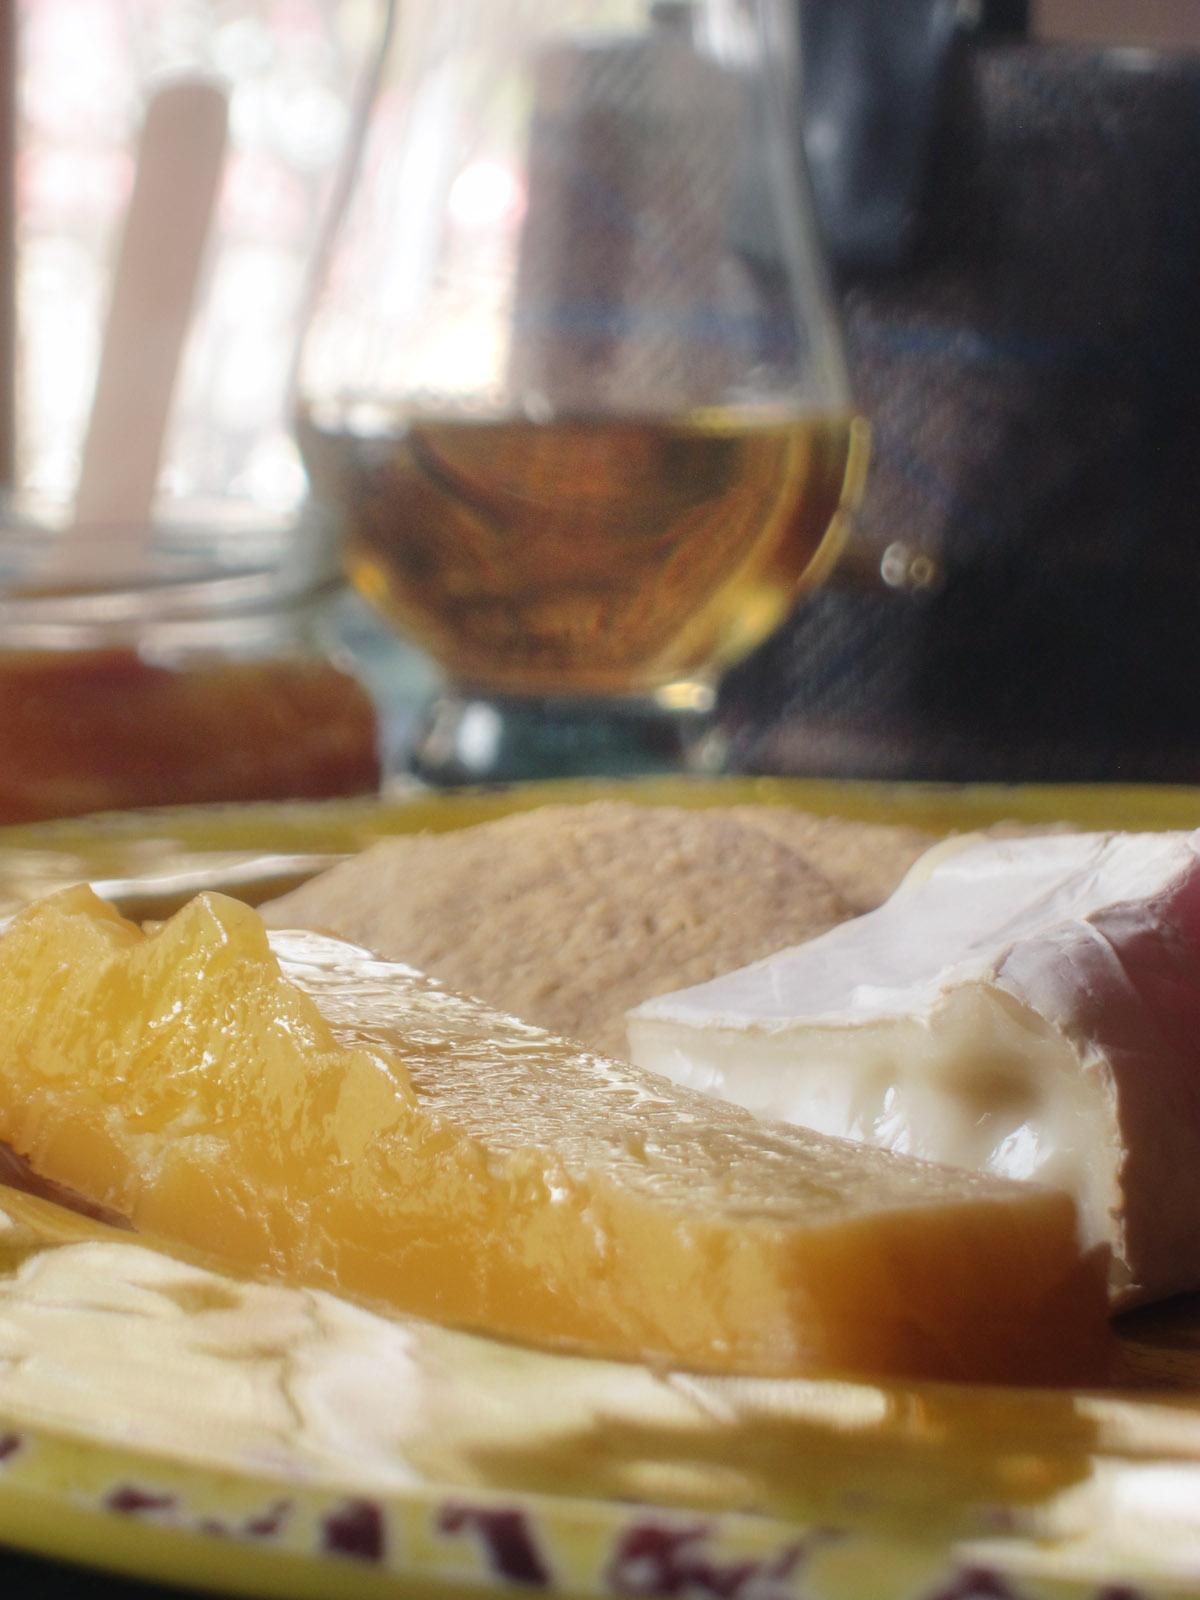 Plowman Lunch - Cheese